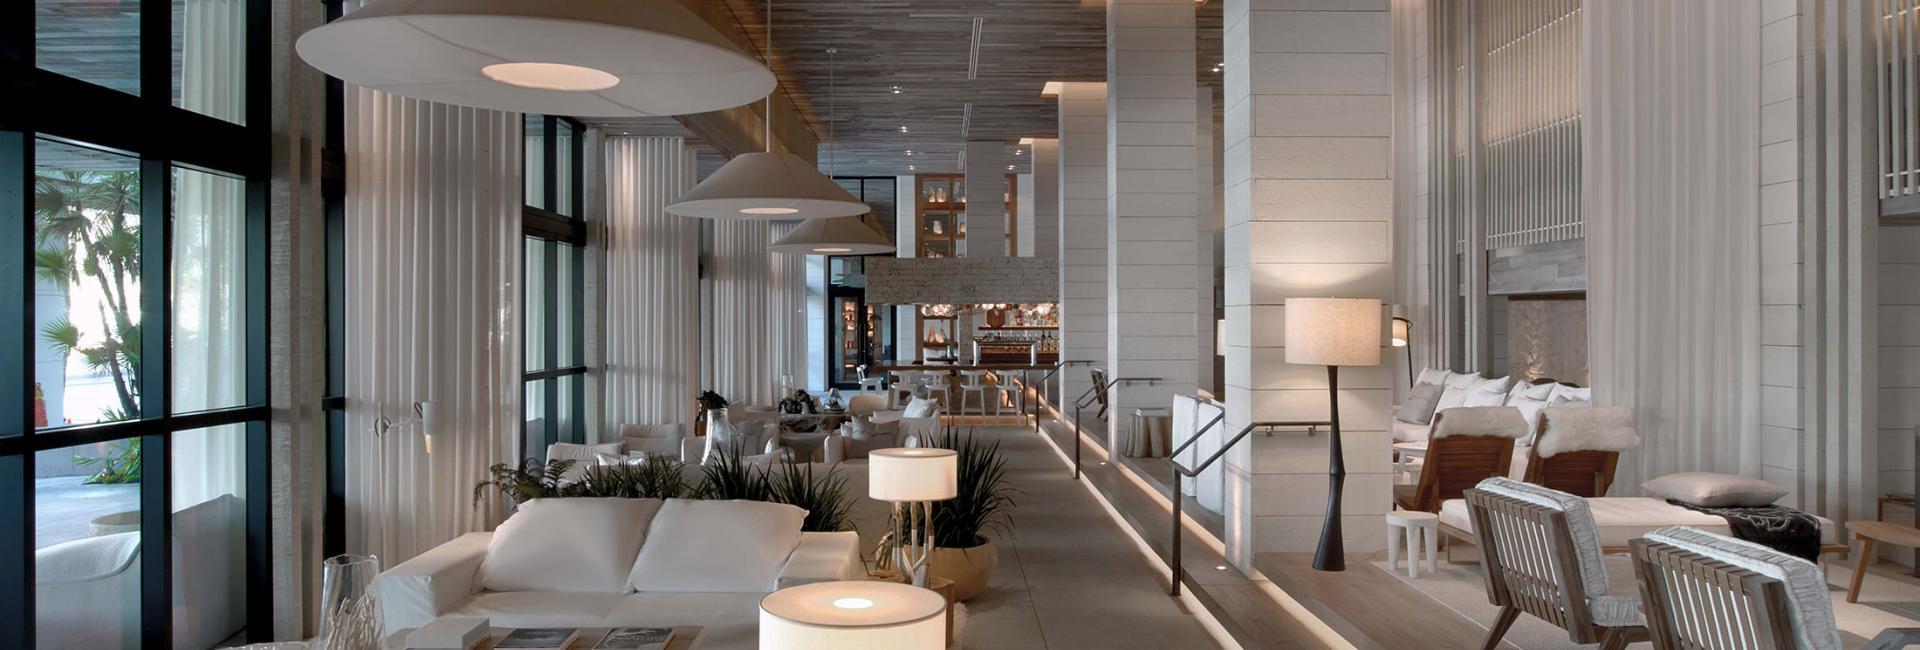 A white, modern hotel lobby.